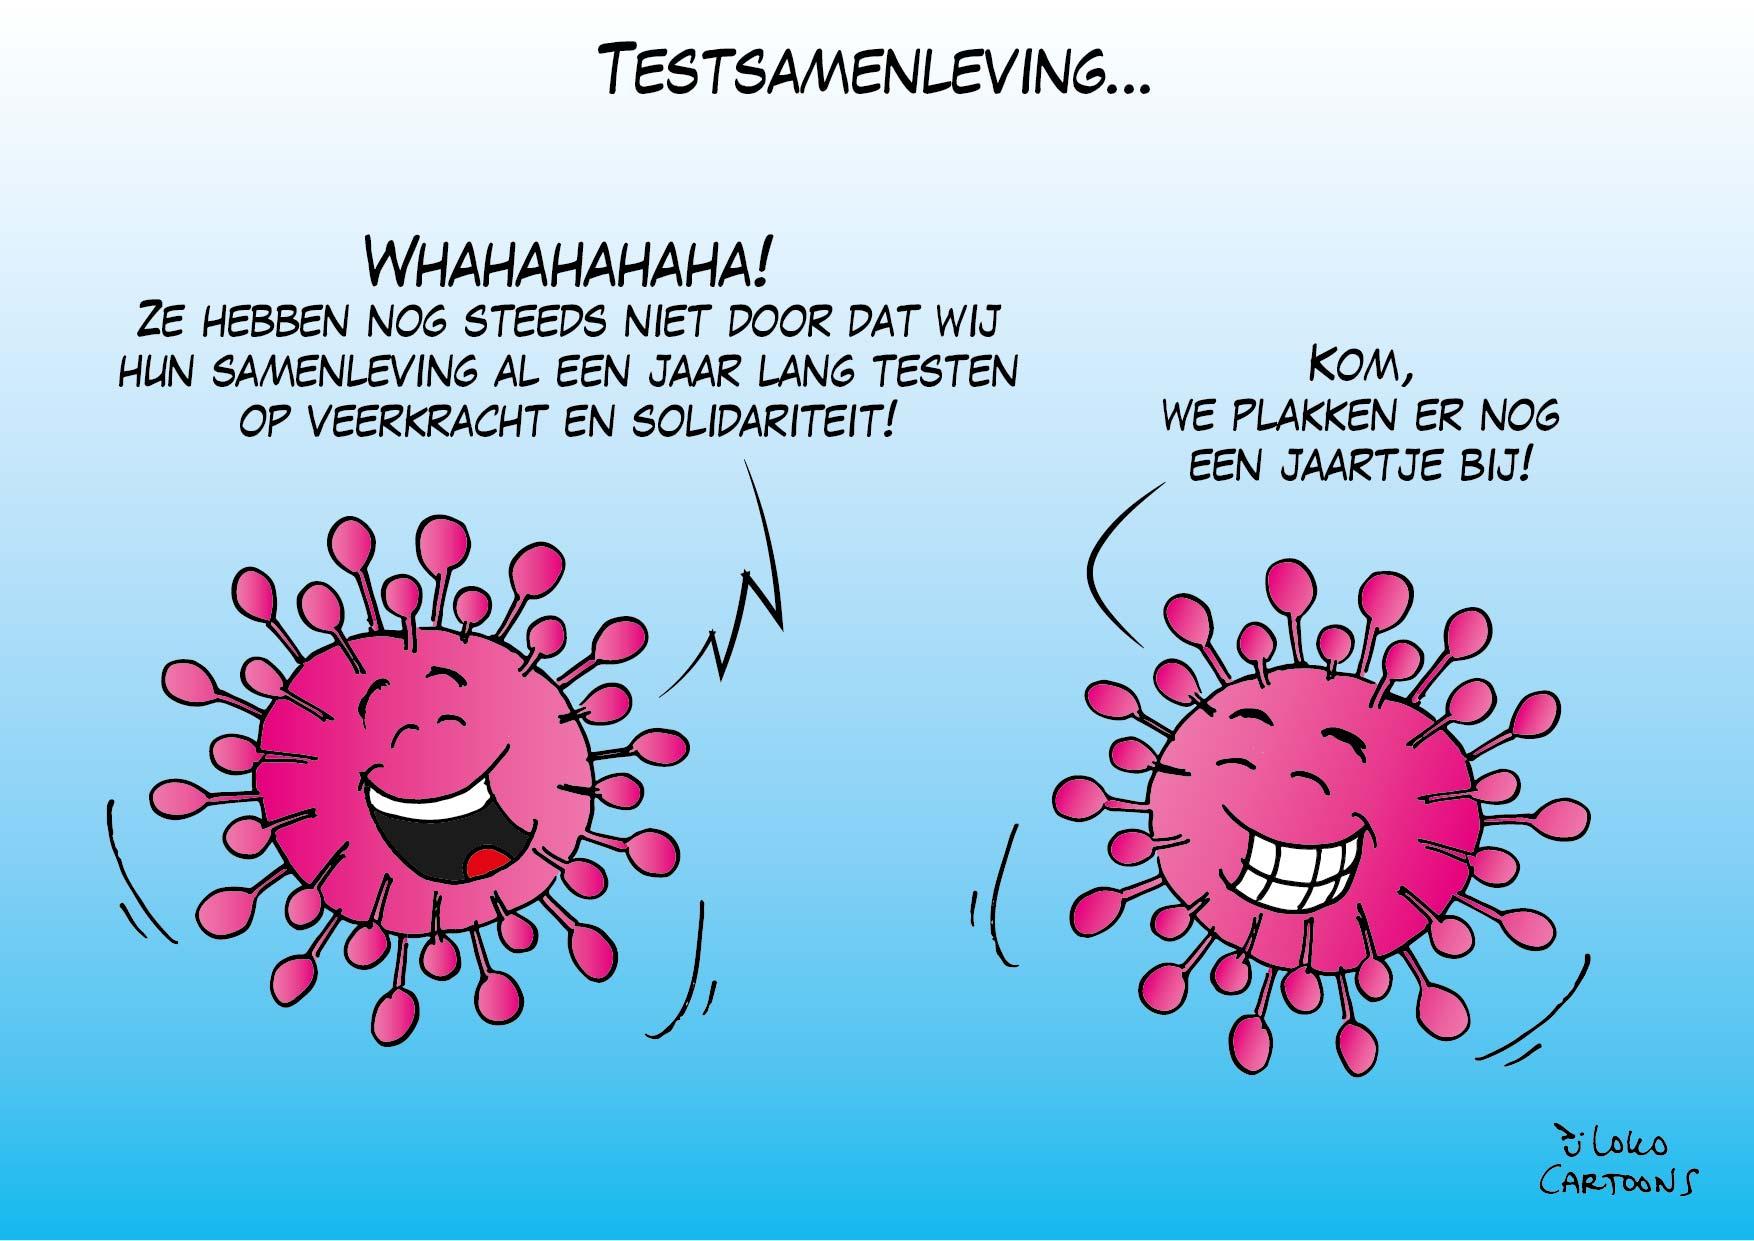 Testsamenleving…